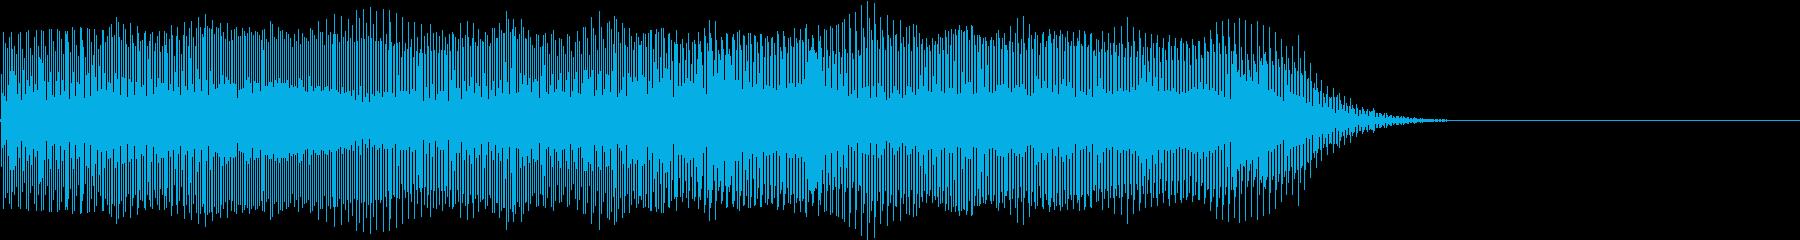 Game 煽る様な挑発エフェクト音の再生済みの波形